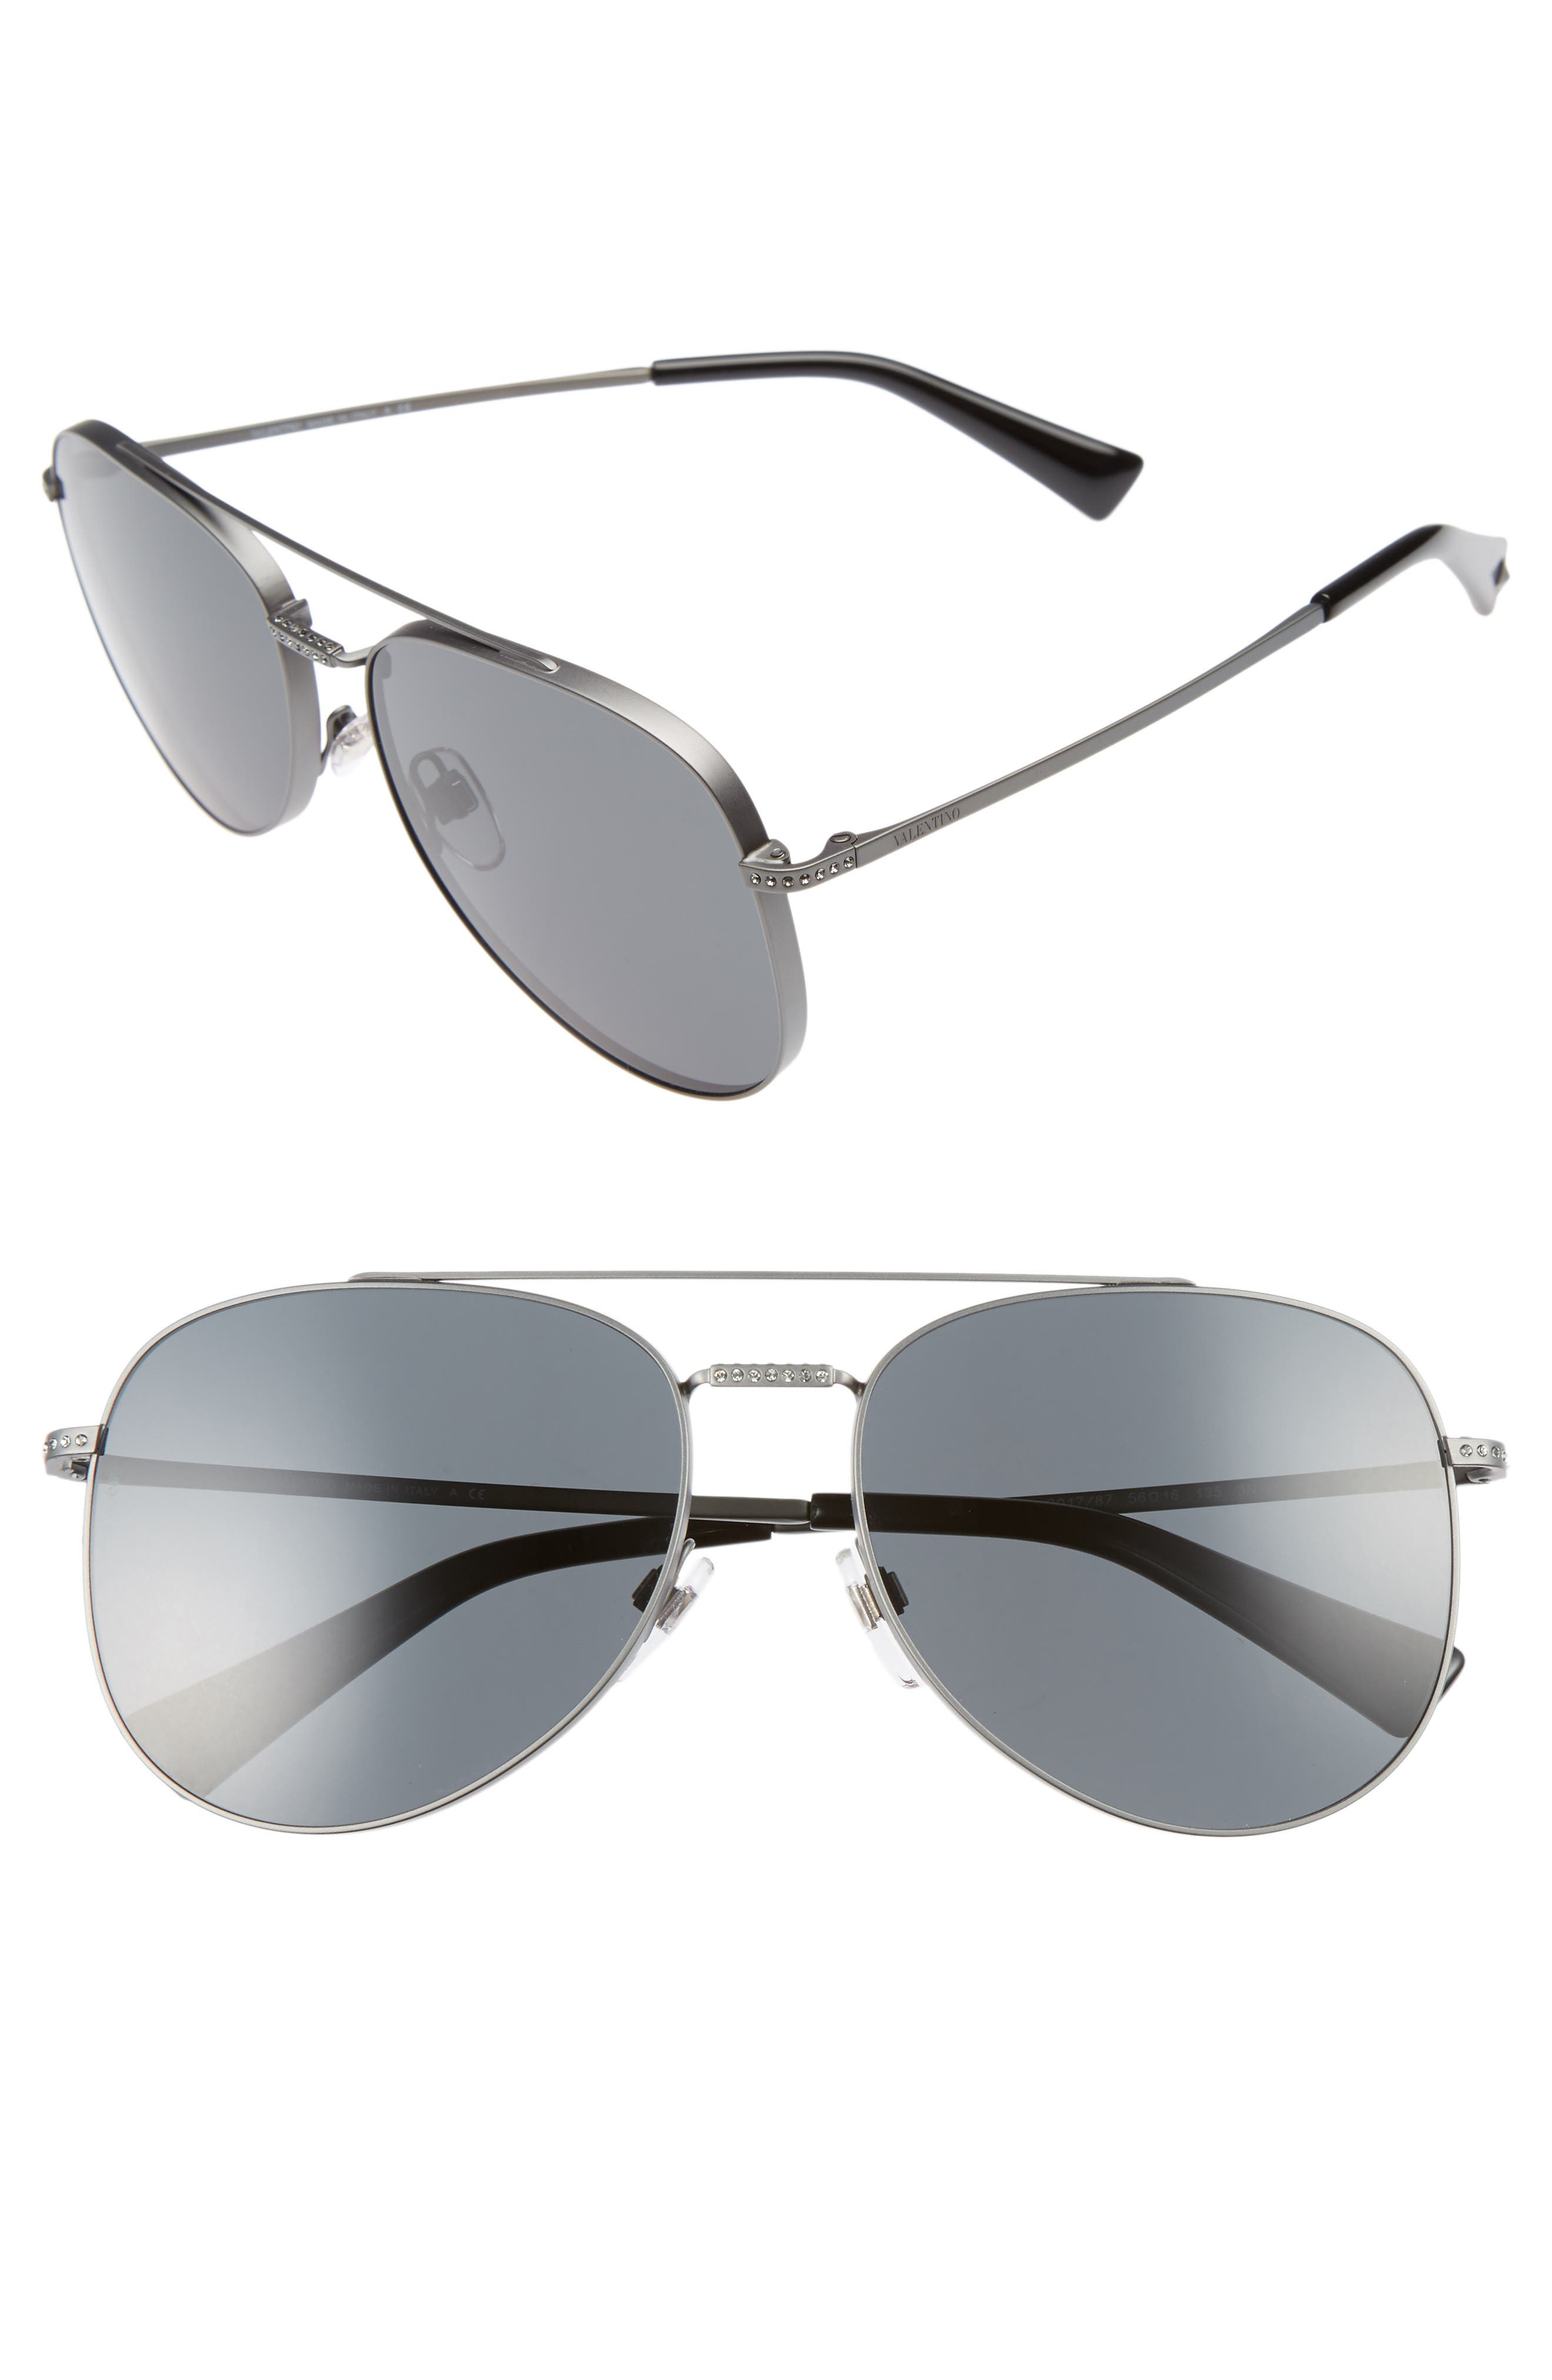 56mm Aviator Sunglasses,                             Main thumbnail 1, color,                             MATTE RUTHENIUM/ GREY CRYSTAL